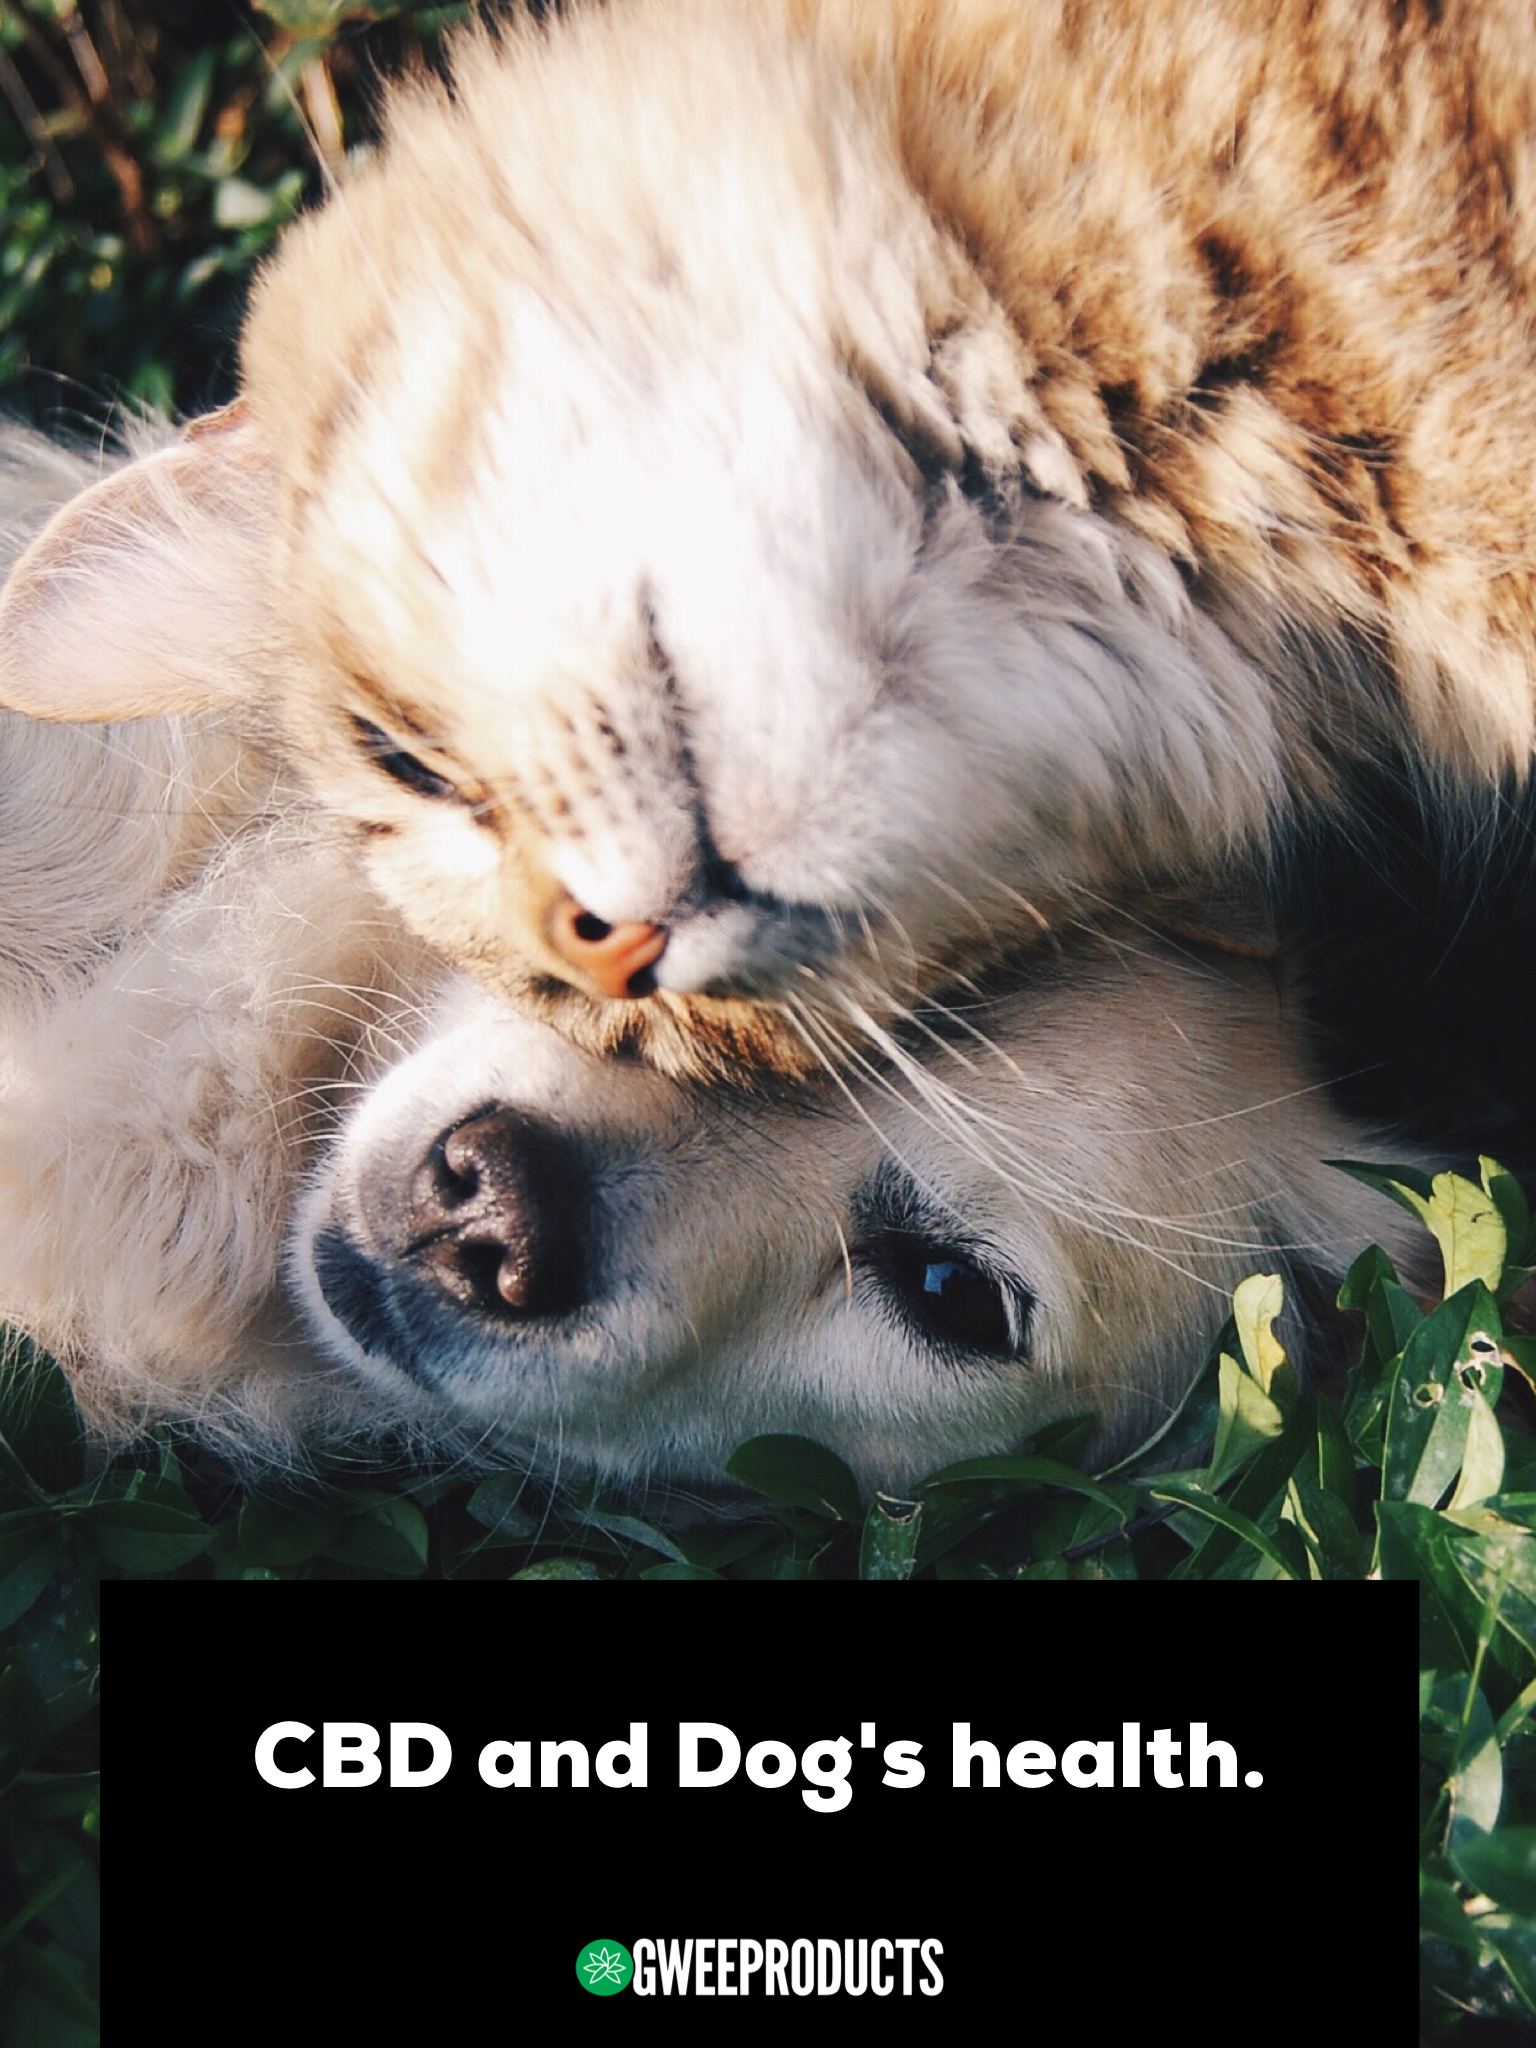 Photo of CBD and Dog's health